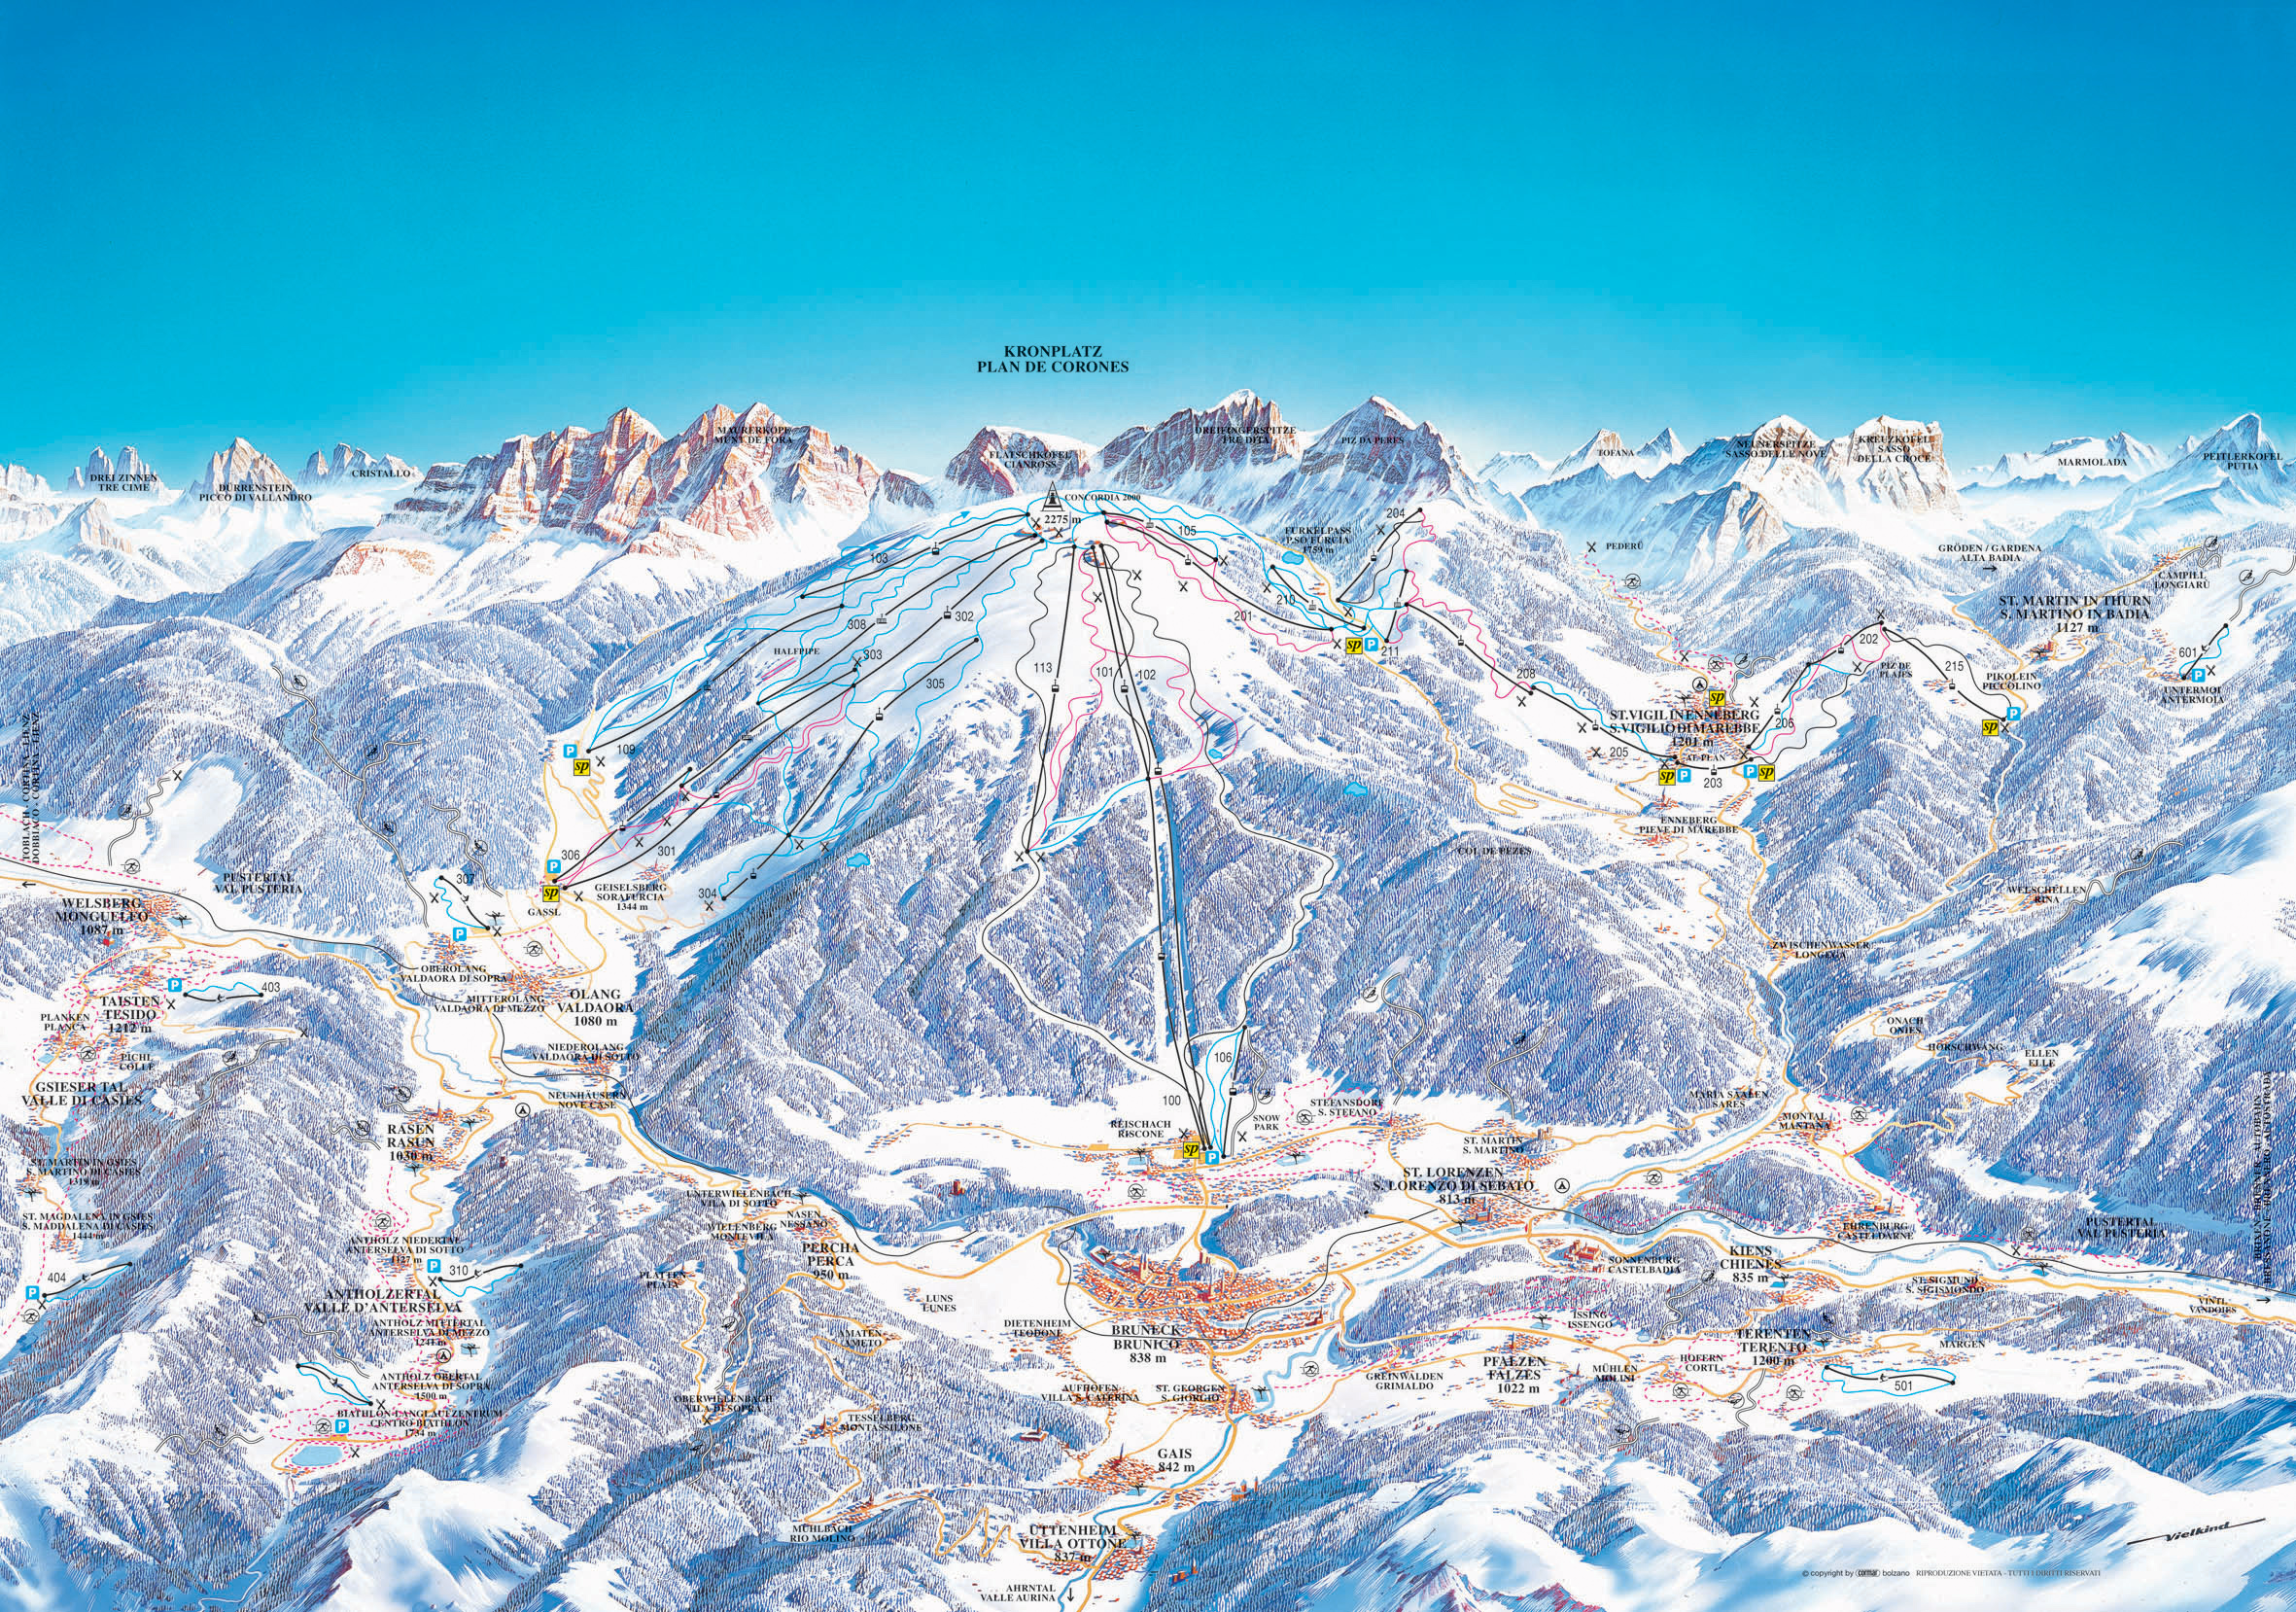 Plan De Corones Kronplatz ski map Dolomiti Superski Italy Europe